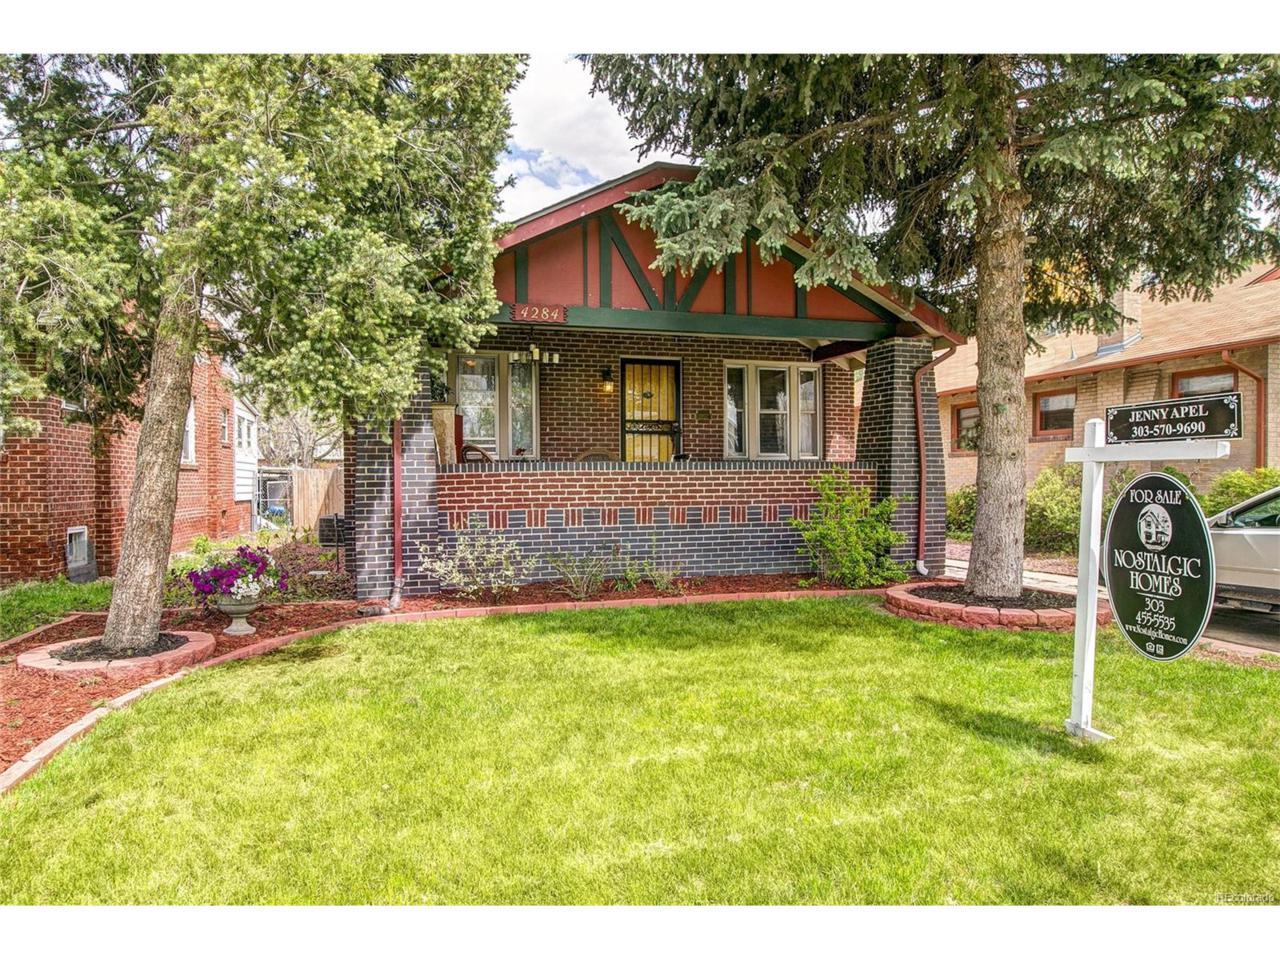 4284 Julian Street, Denver, CO 80211 (MLS #5542240) :: 8z Real Estate